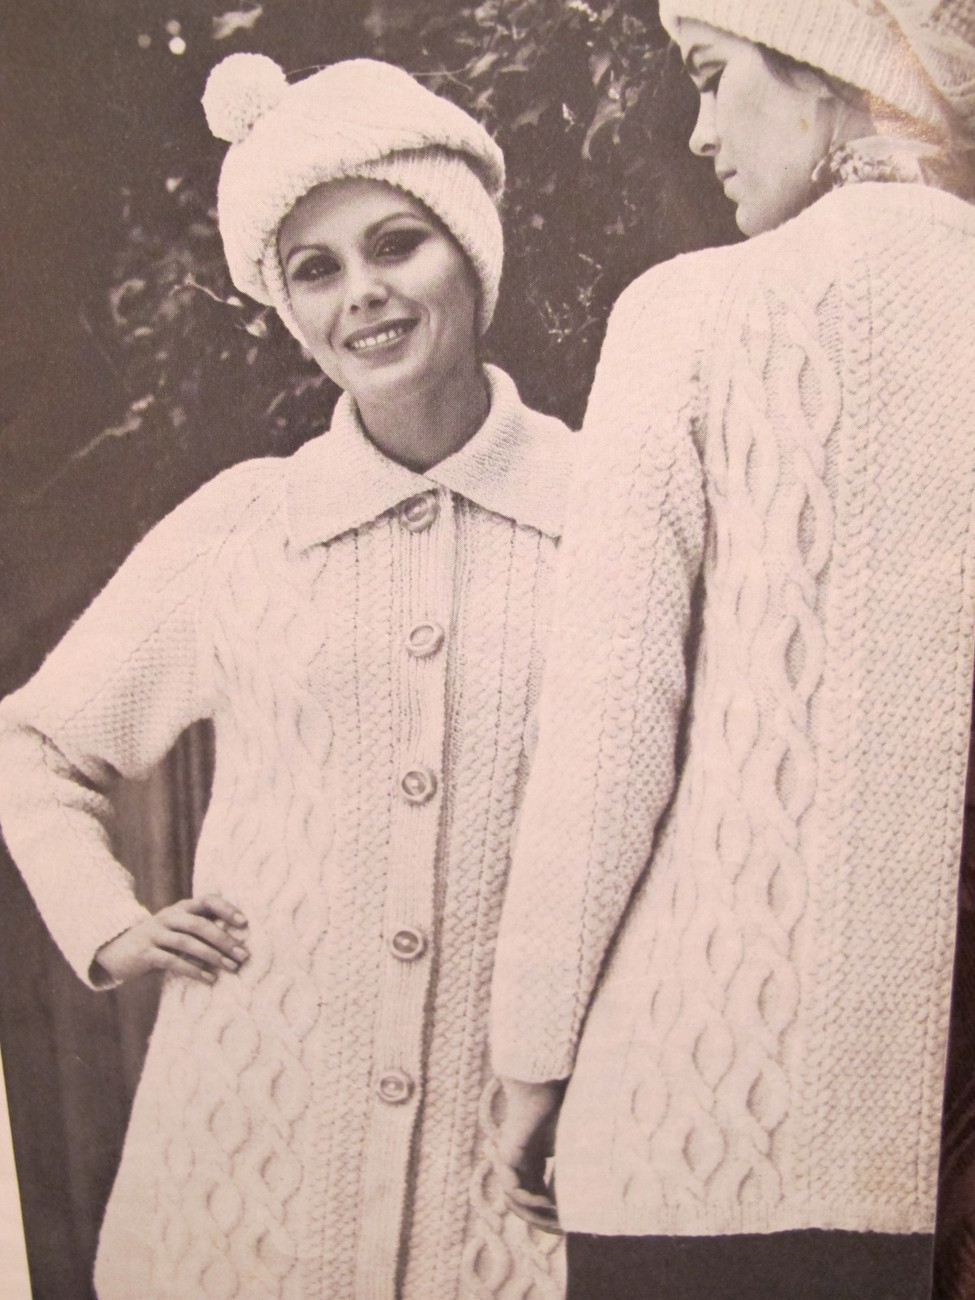 Vintage Spinrite Irish Knit Knitting Patterns Sweaters Toques Dress etc. FAMILY